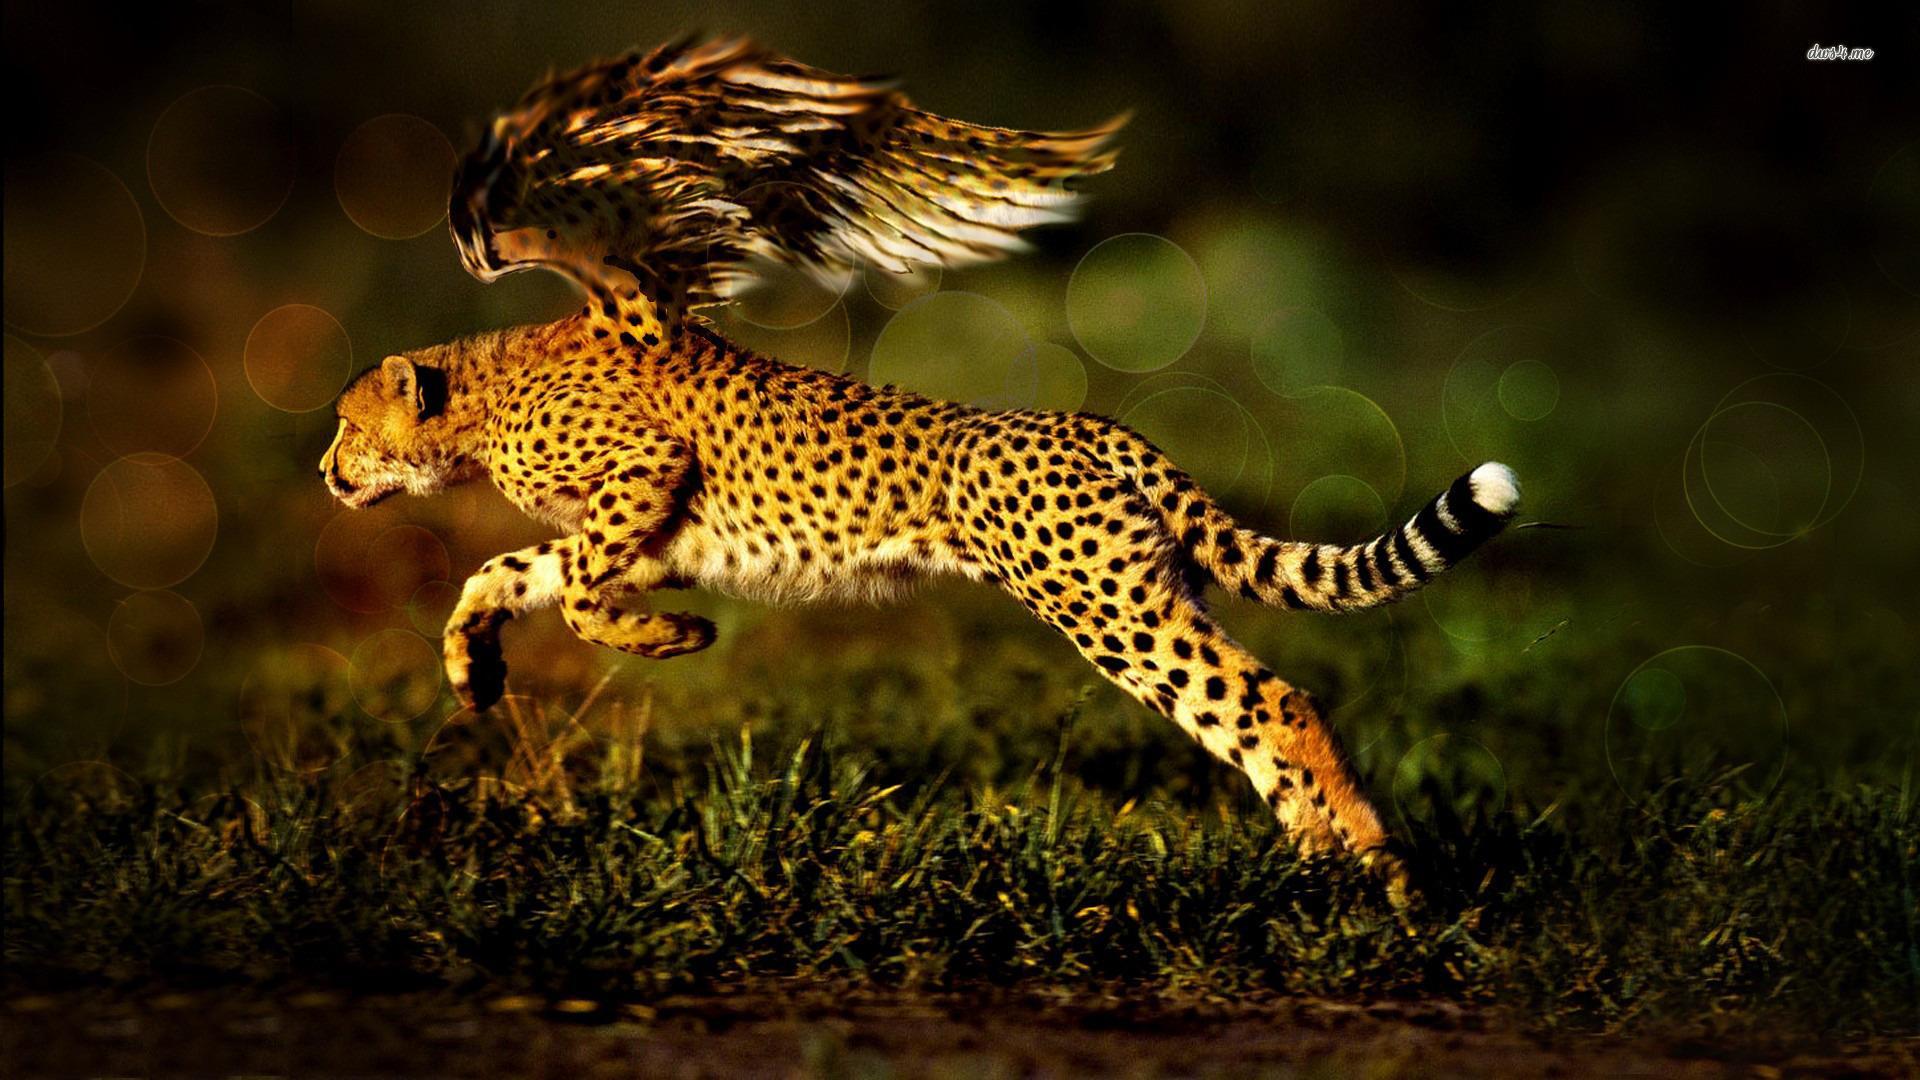 All Animals Wallpaper: Fantasy Animals Wallpaper HD Download